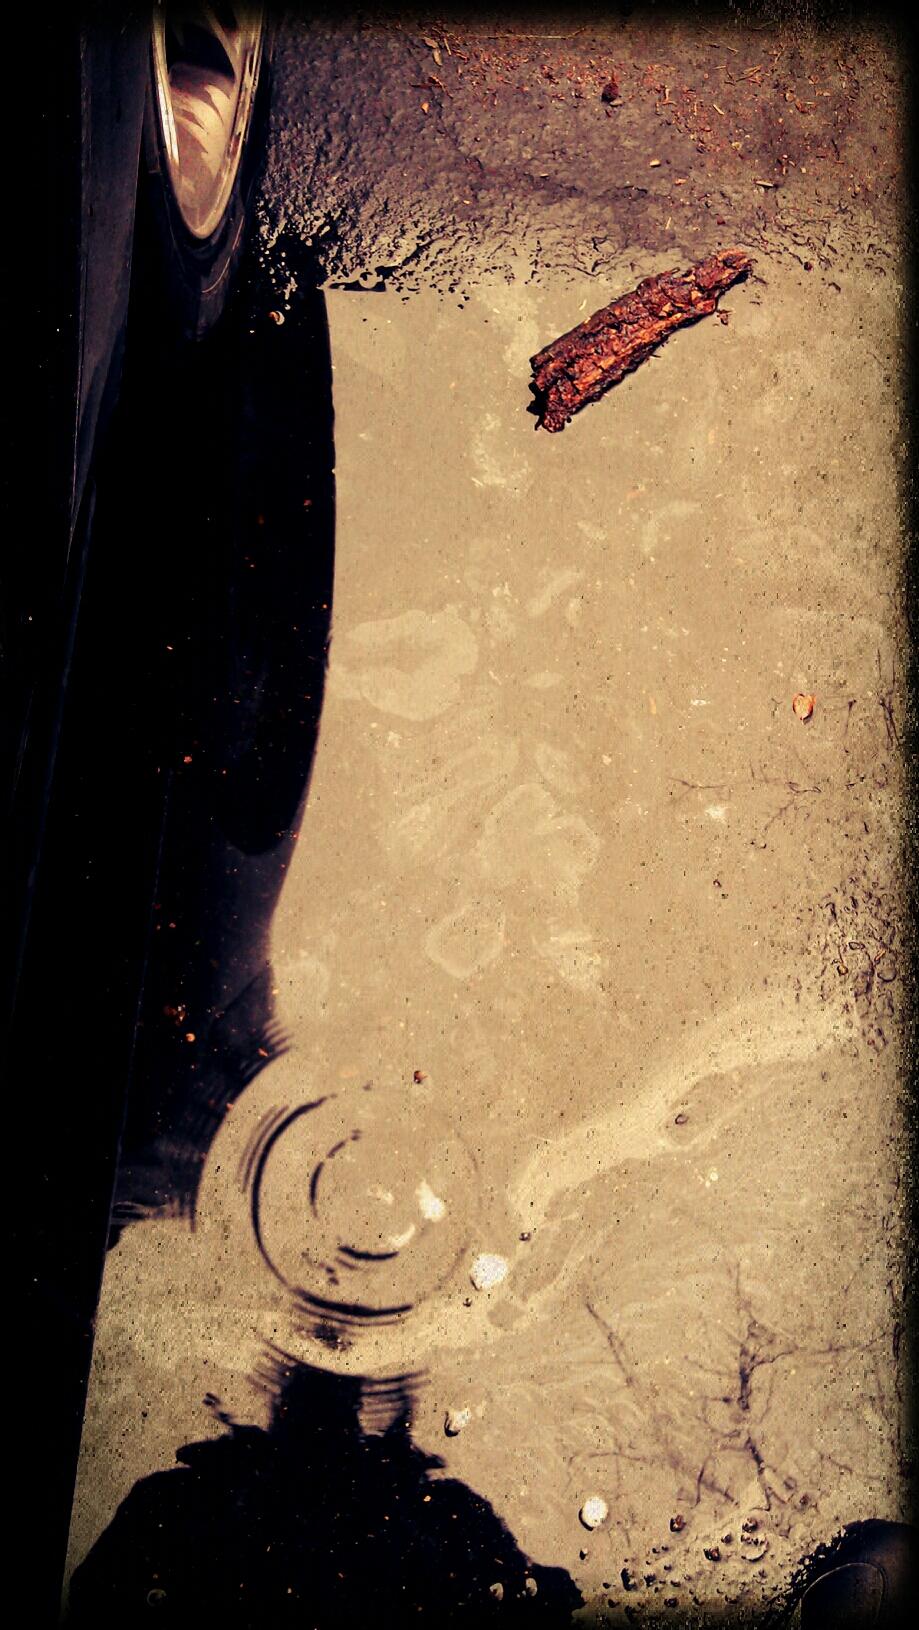 piscine la roche sur yon photo H14UgS5